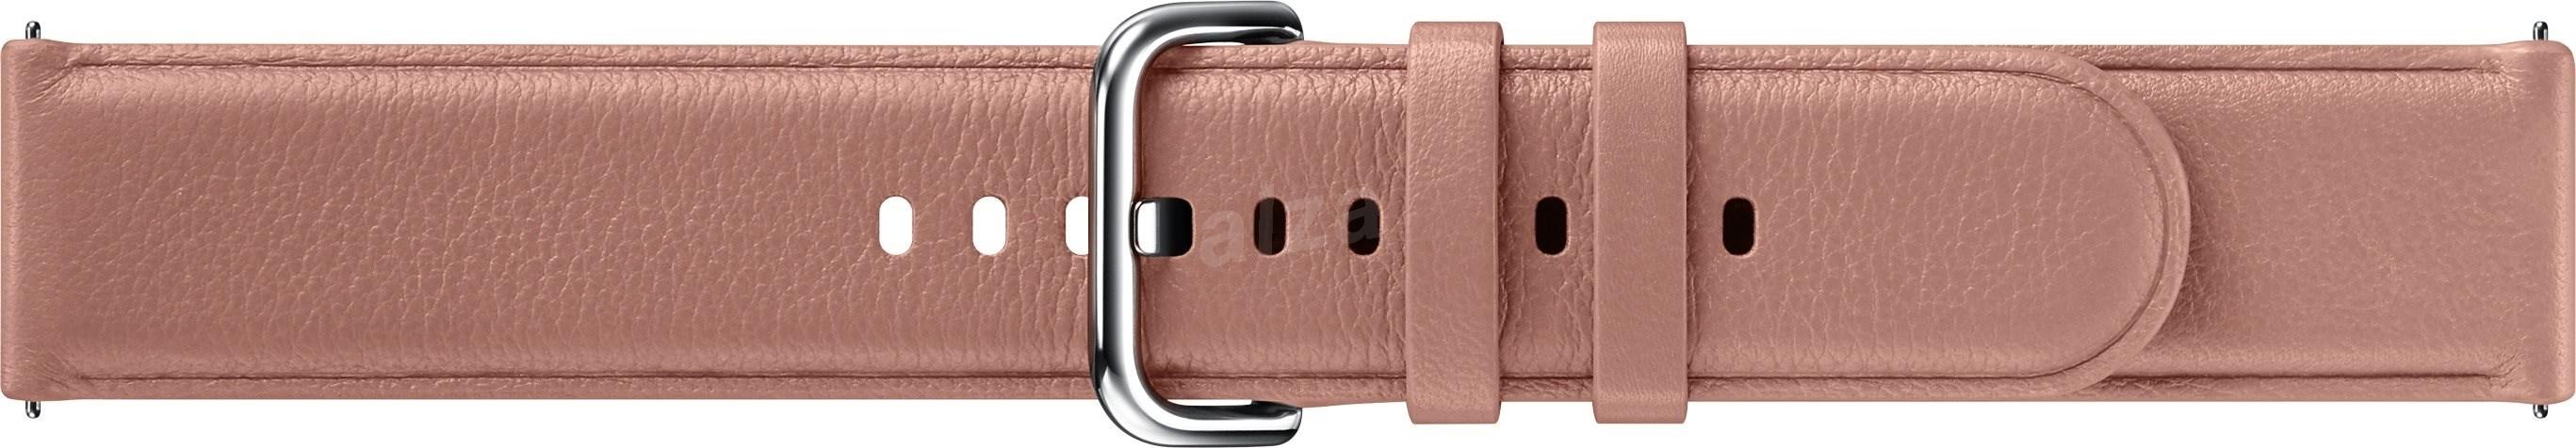 Samsung bőrszíj Galaxy Watch Active 2 okosórához  20mm - rózsaszín - Szíj